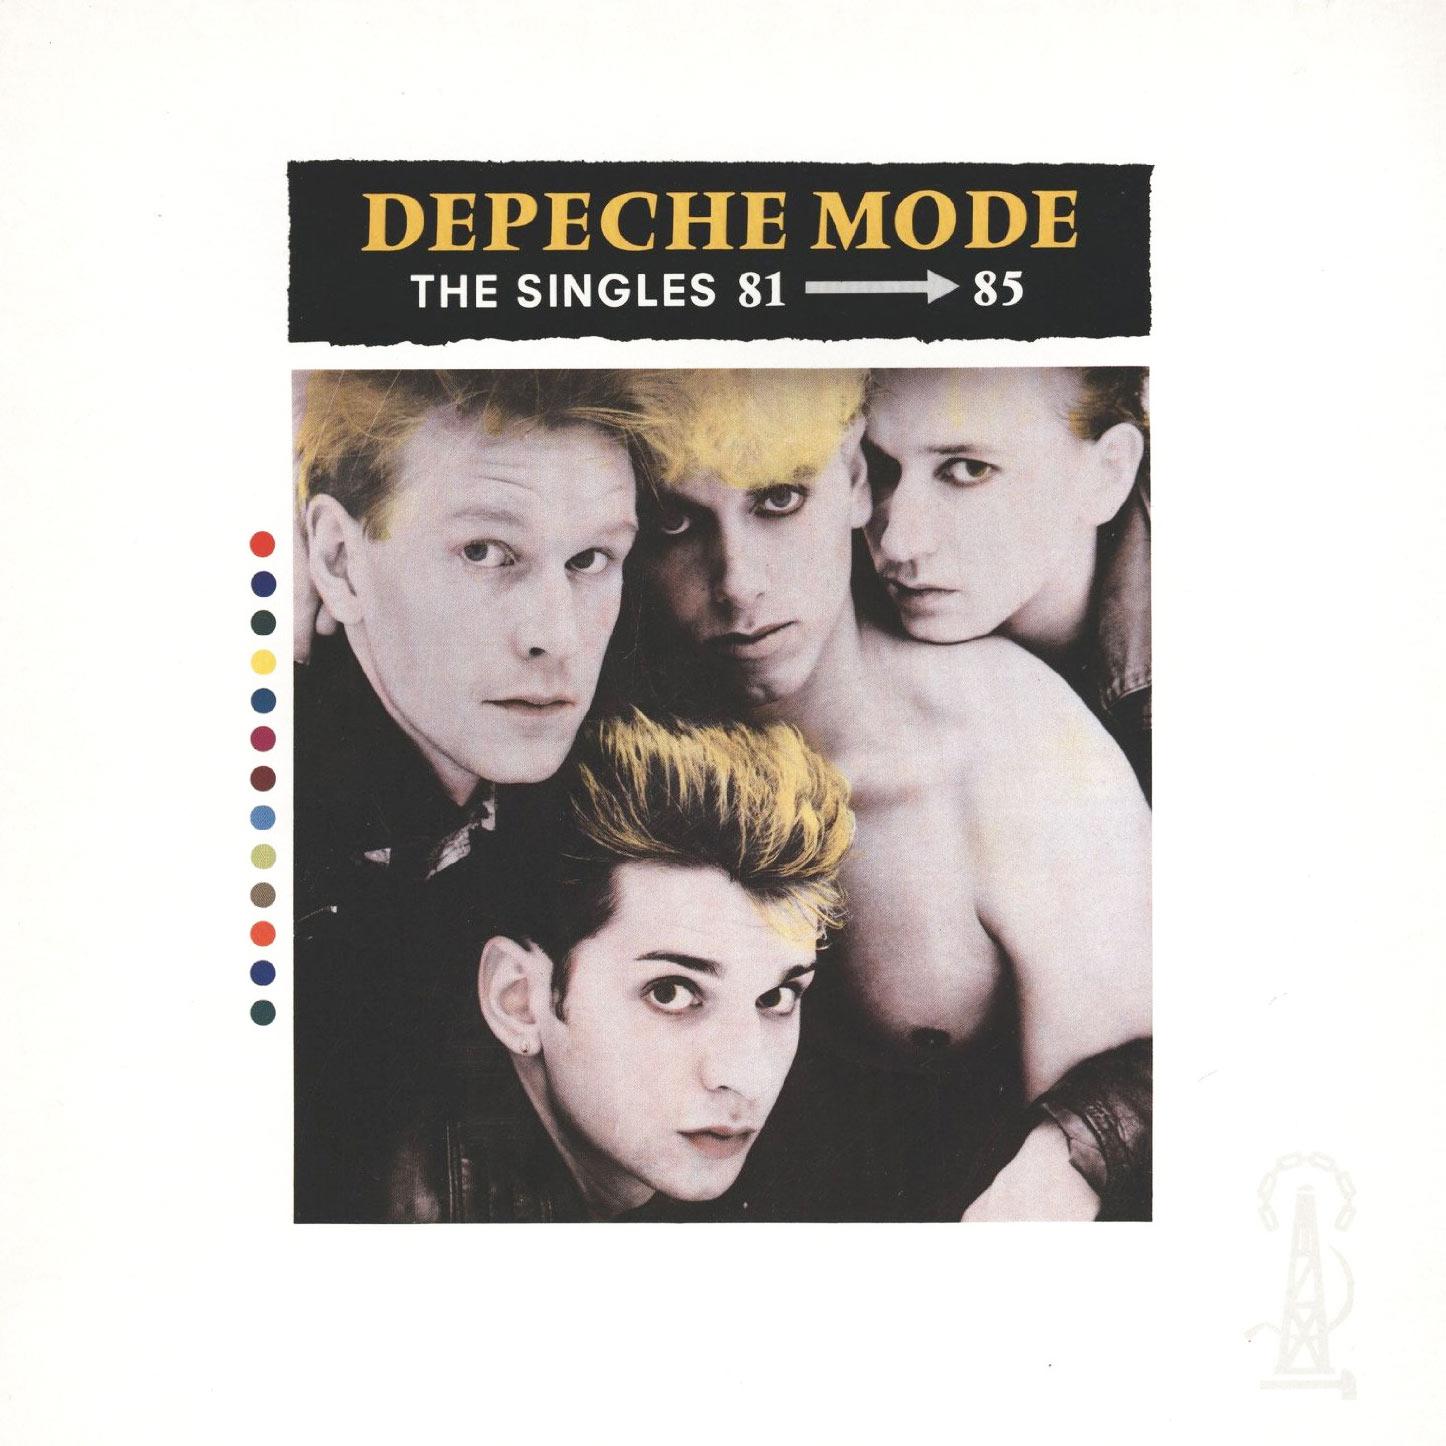 Depeche Mode: The Singles 81 - 85